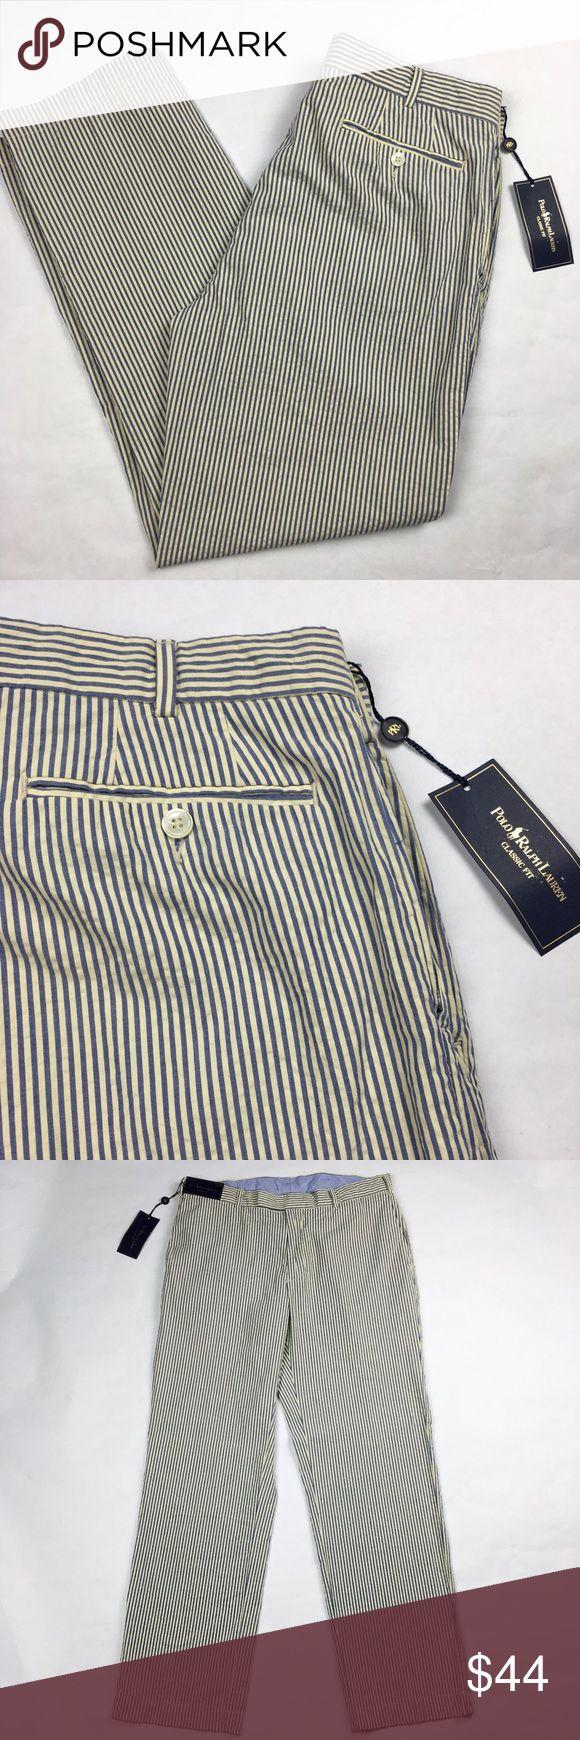 Polo Ralph Lauren Blue Seersucker Pants 34x30 Polo Ralph Lauren Blue Cream Seersucker Pants  • 34x30 • Classic fit • Flat front  • NWT Polo by Ralph Lauren Pants